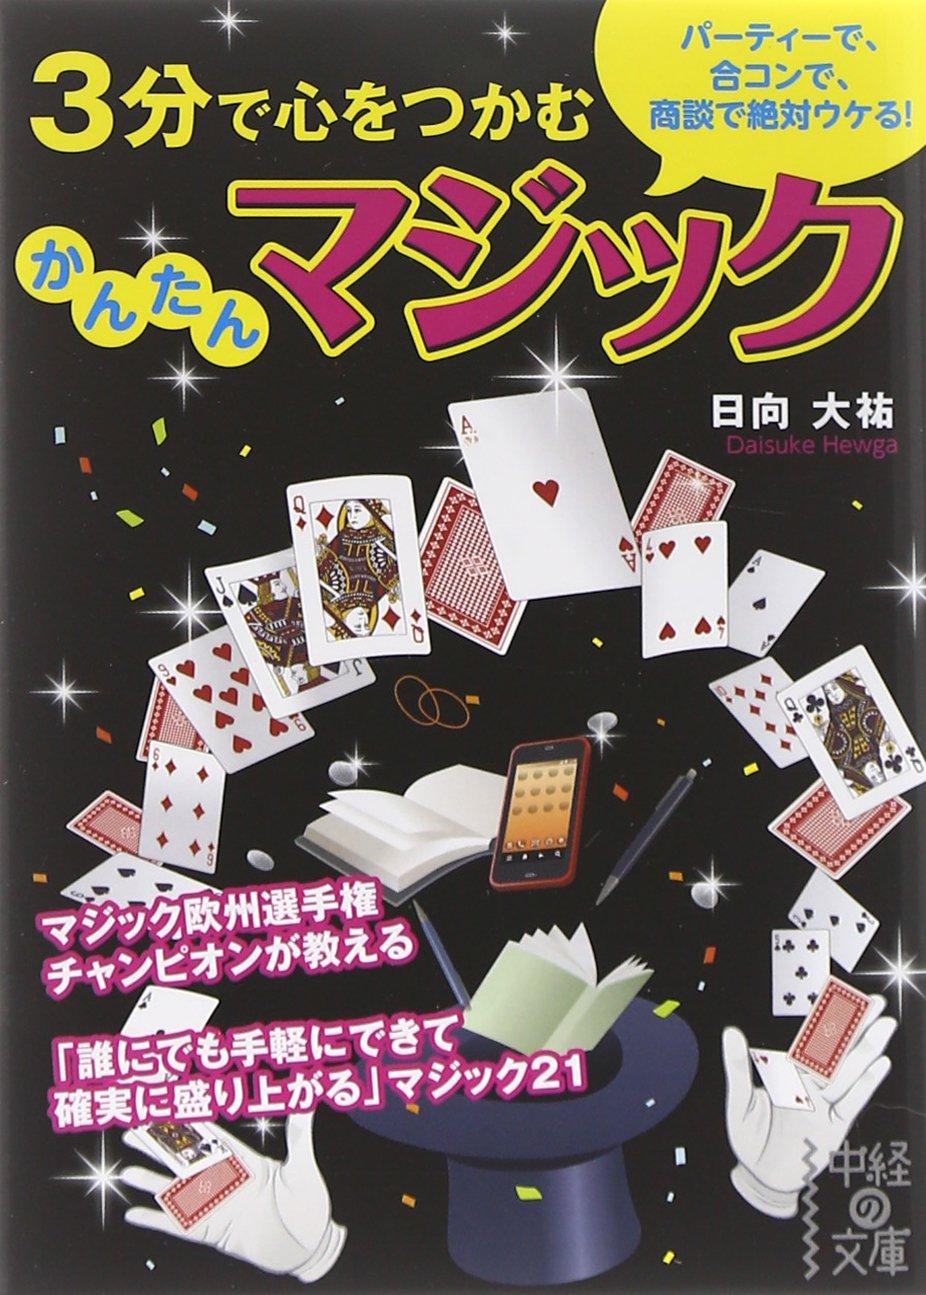 Sanpun de kokoro o tsukamu kantan majikku : pātī de gōkon de shōdan de zettai ukeru pdf